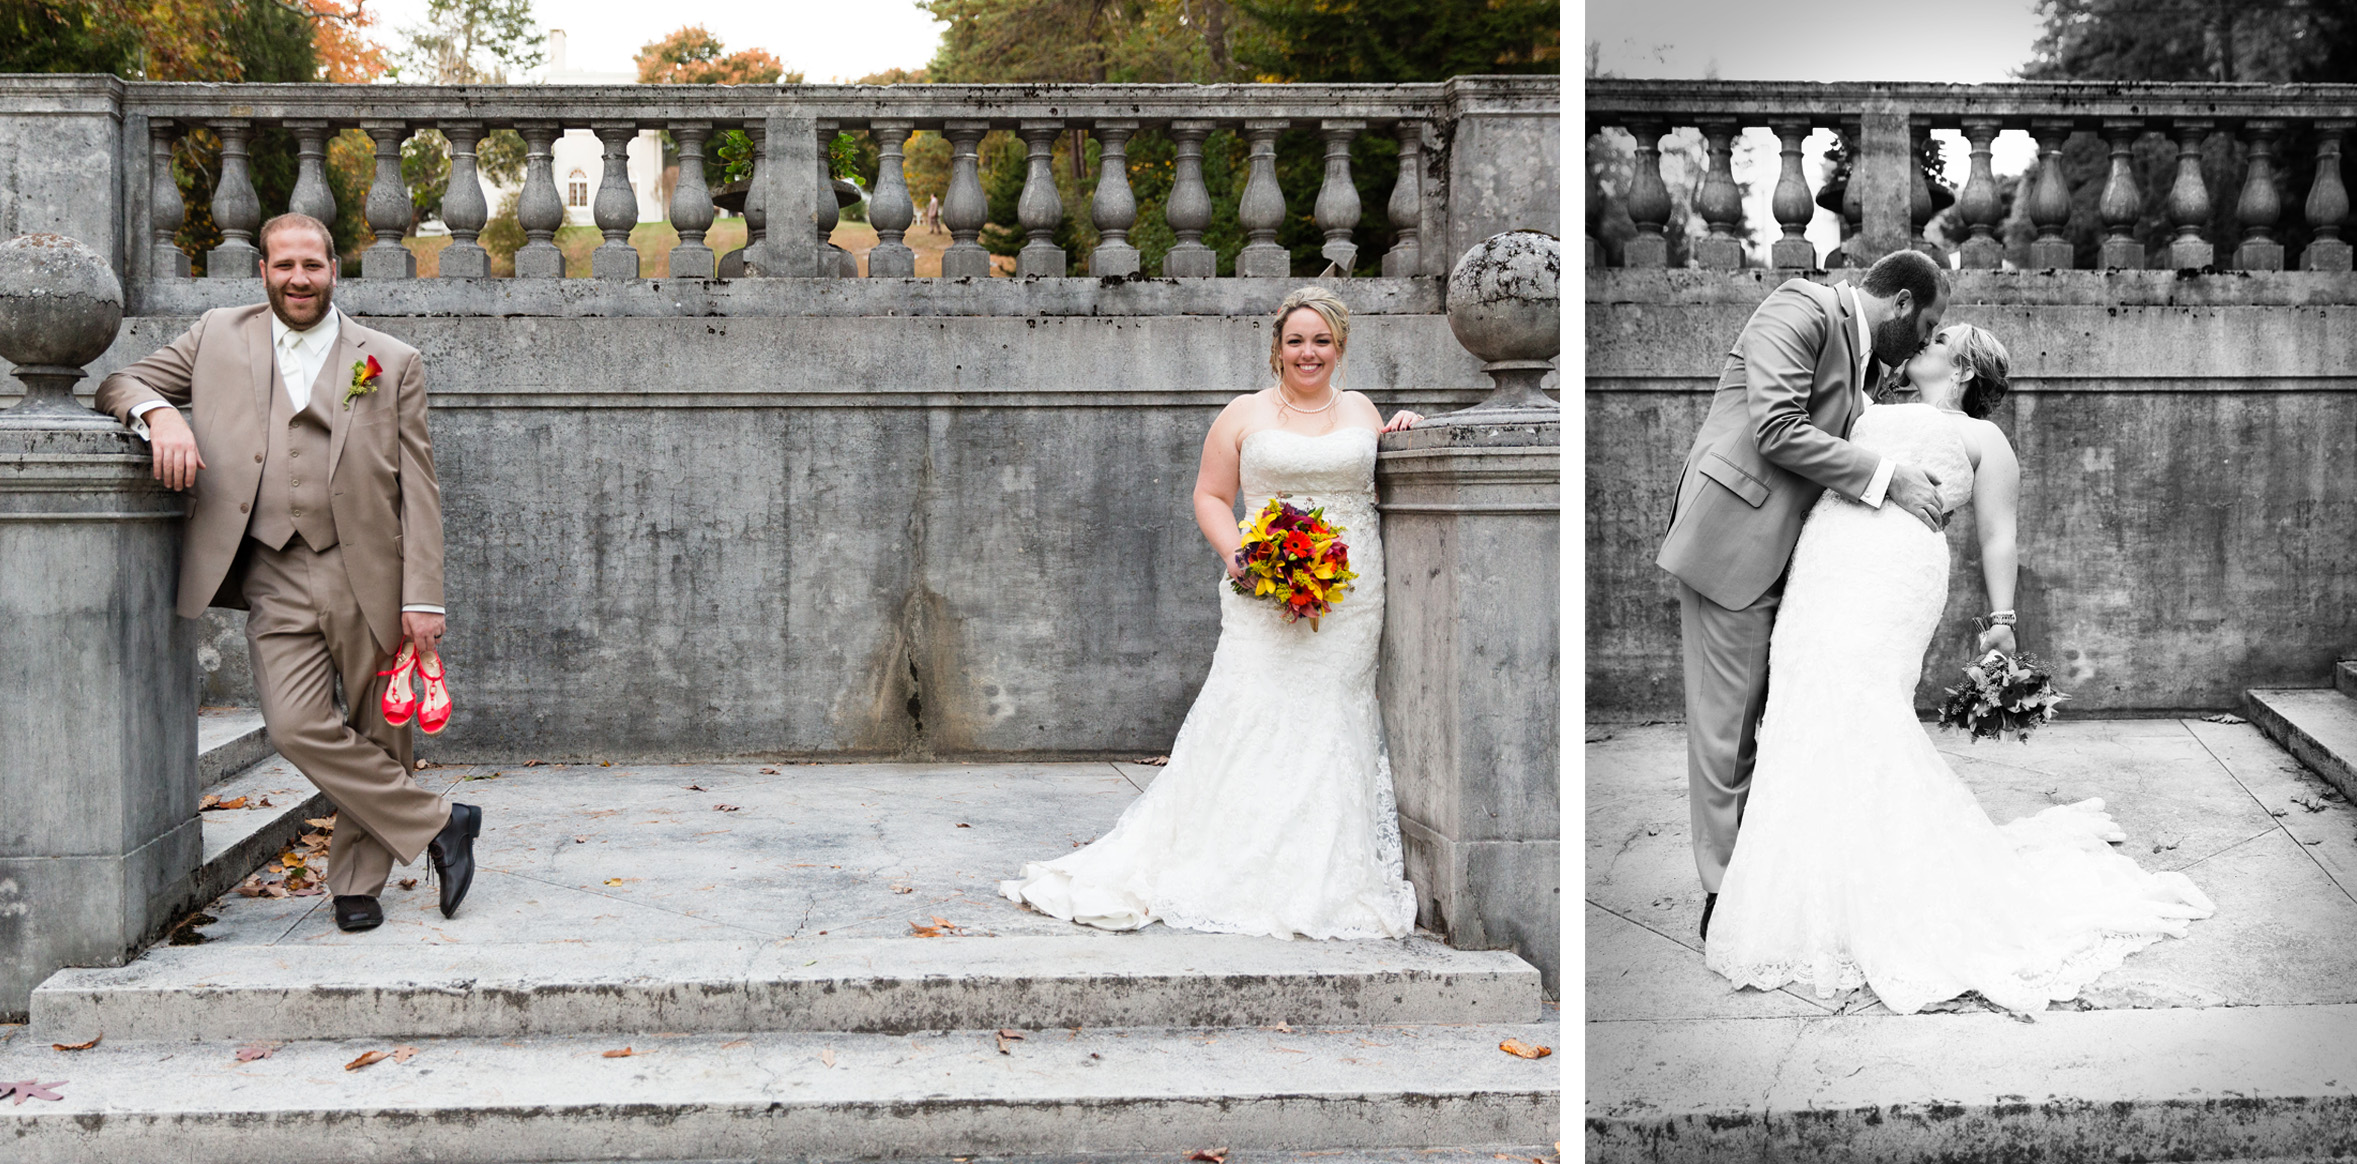 20-bride-groom-formals.jpg